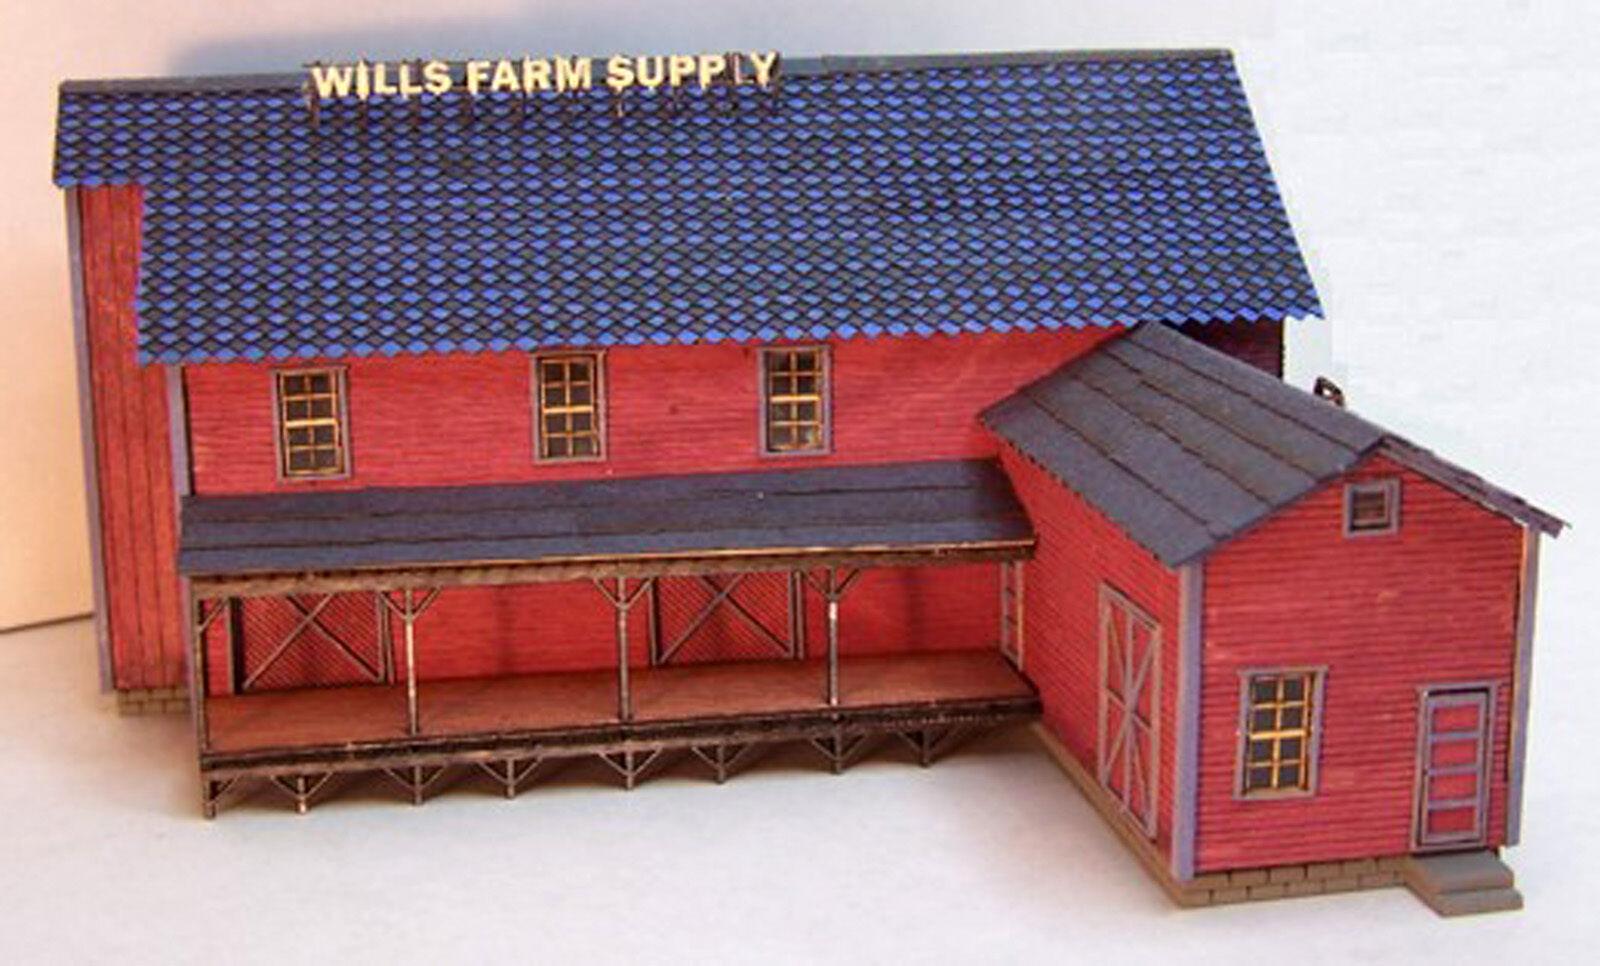 WILL'S FEED & SEED N Scale Model Railroad Structure Unptd Wood Laser Kit RSL3008